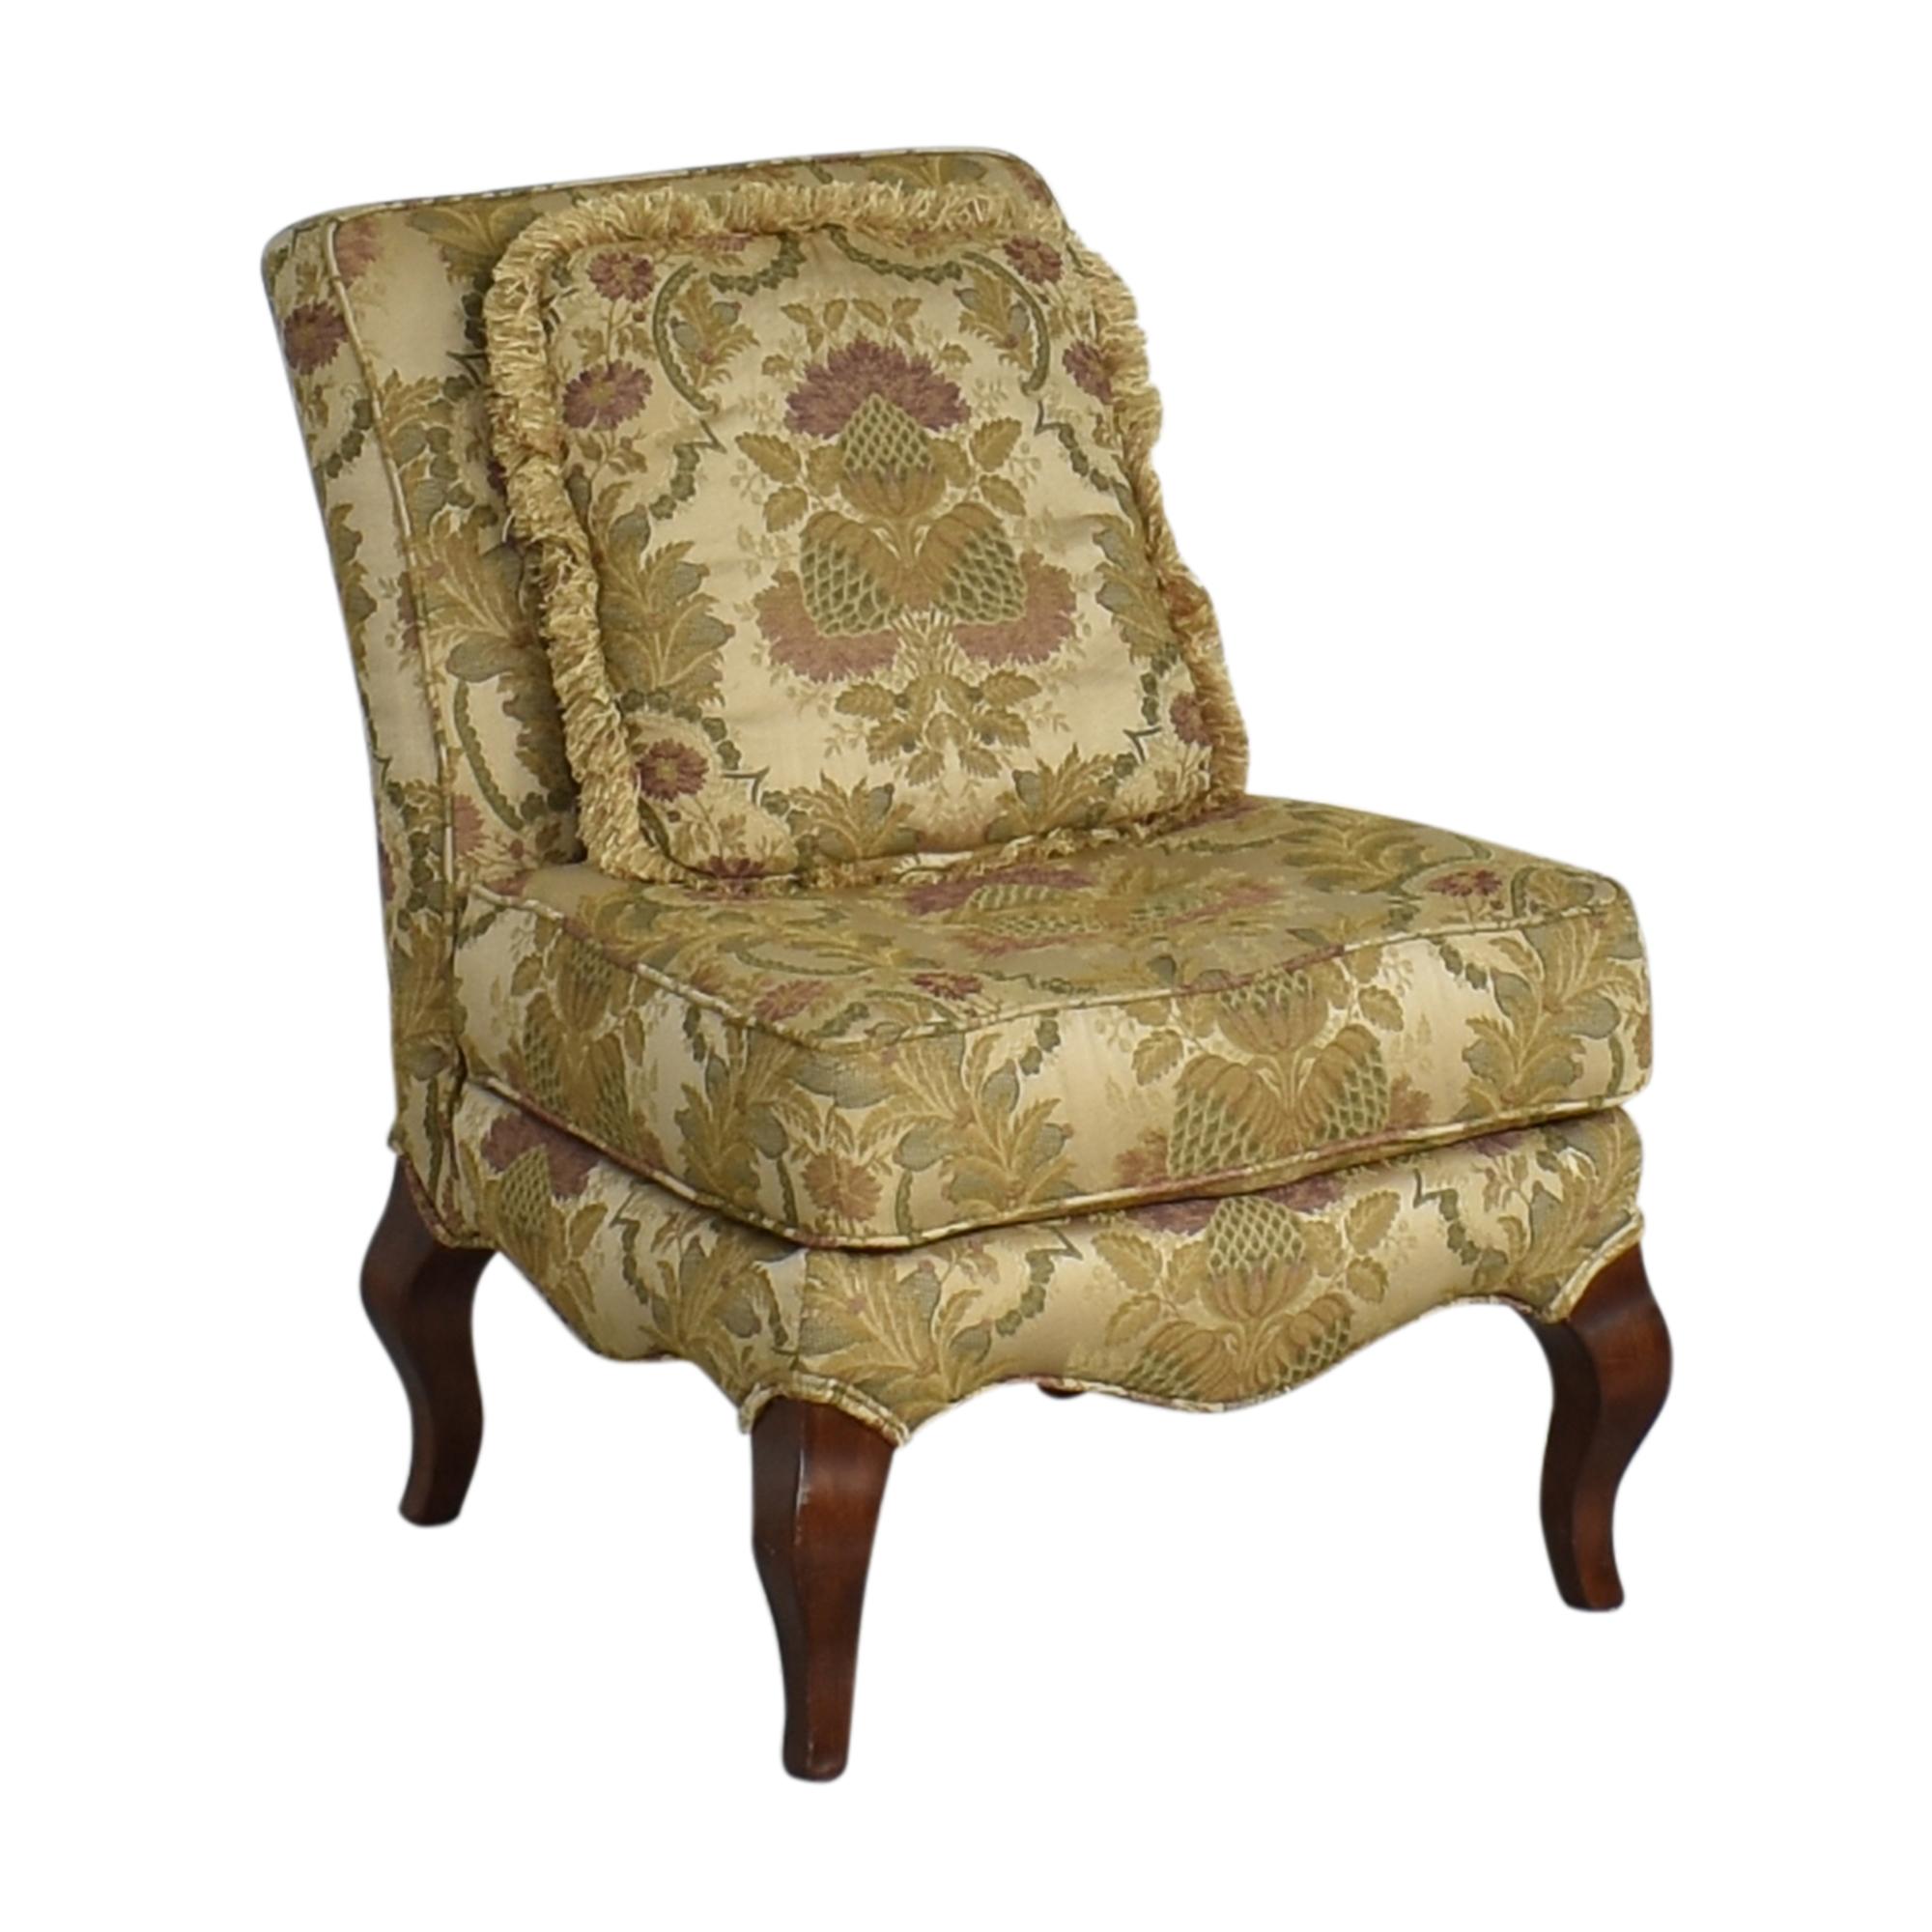 Domain Home Slipper Chair / Accent Chairs